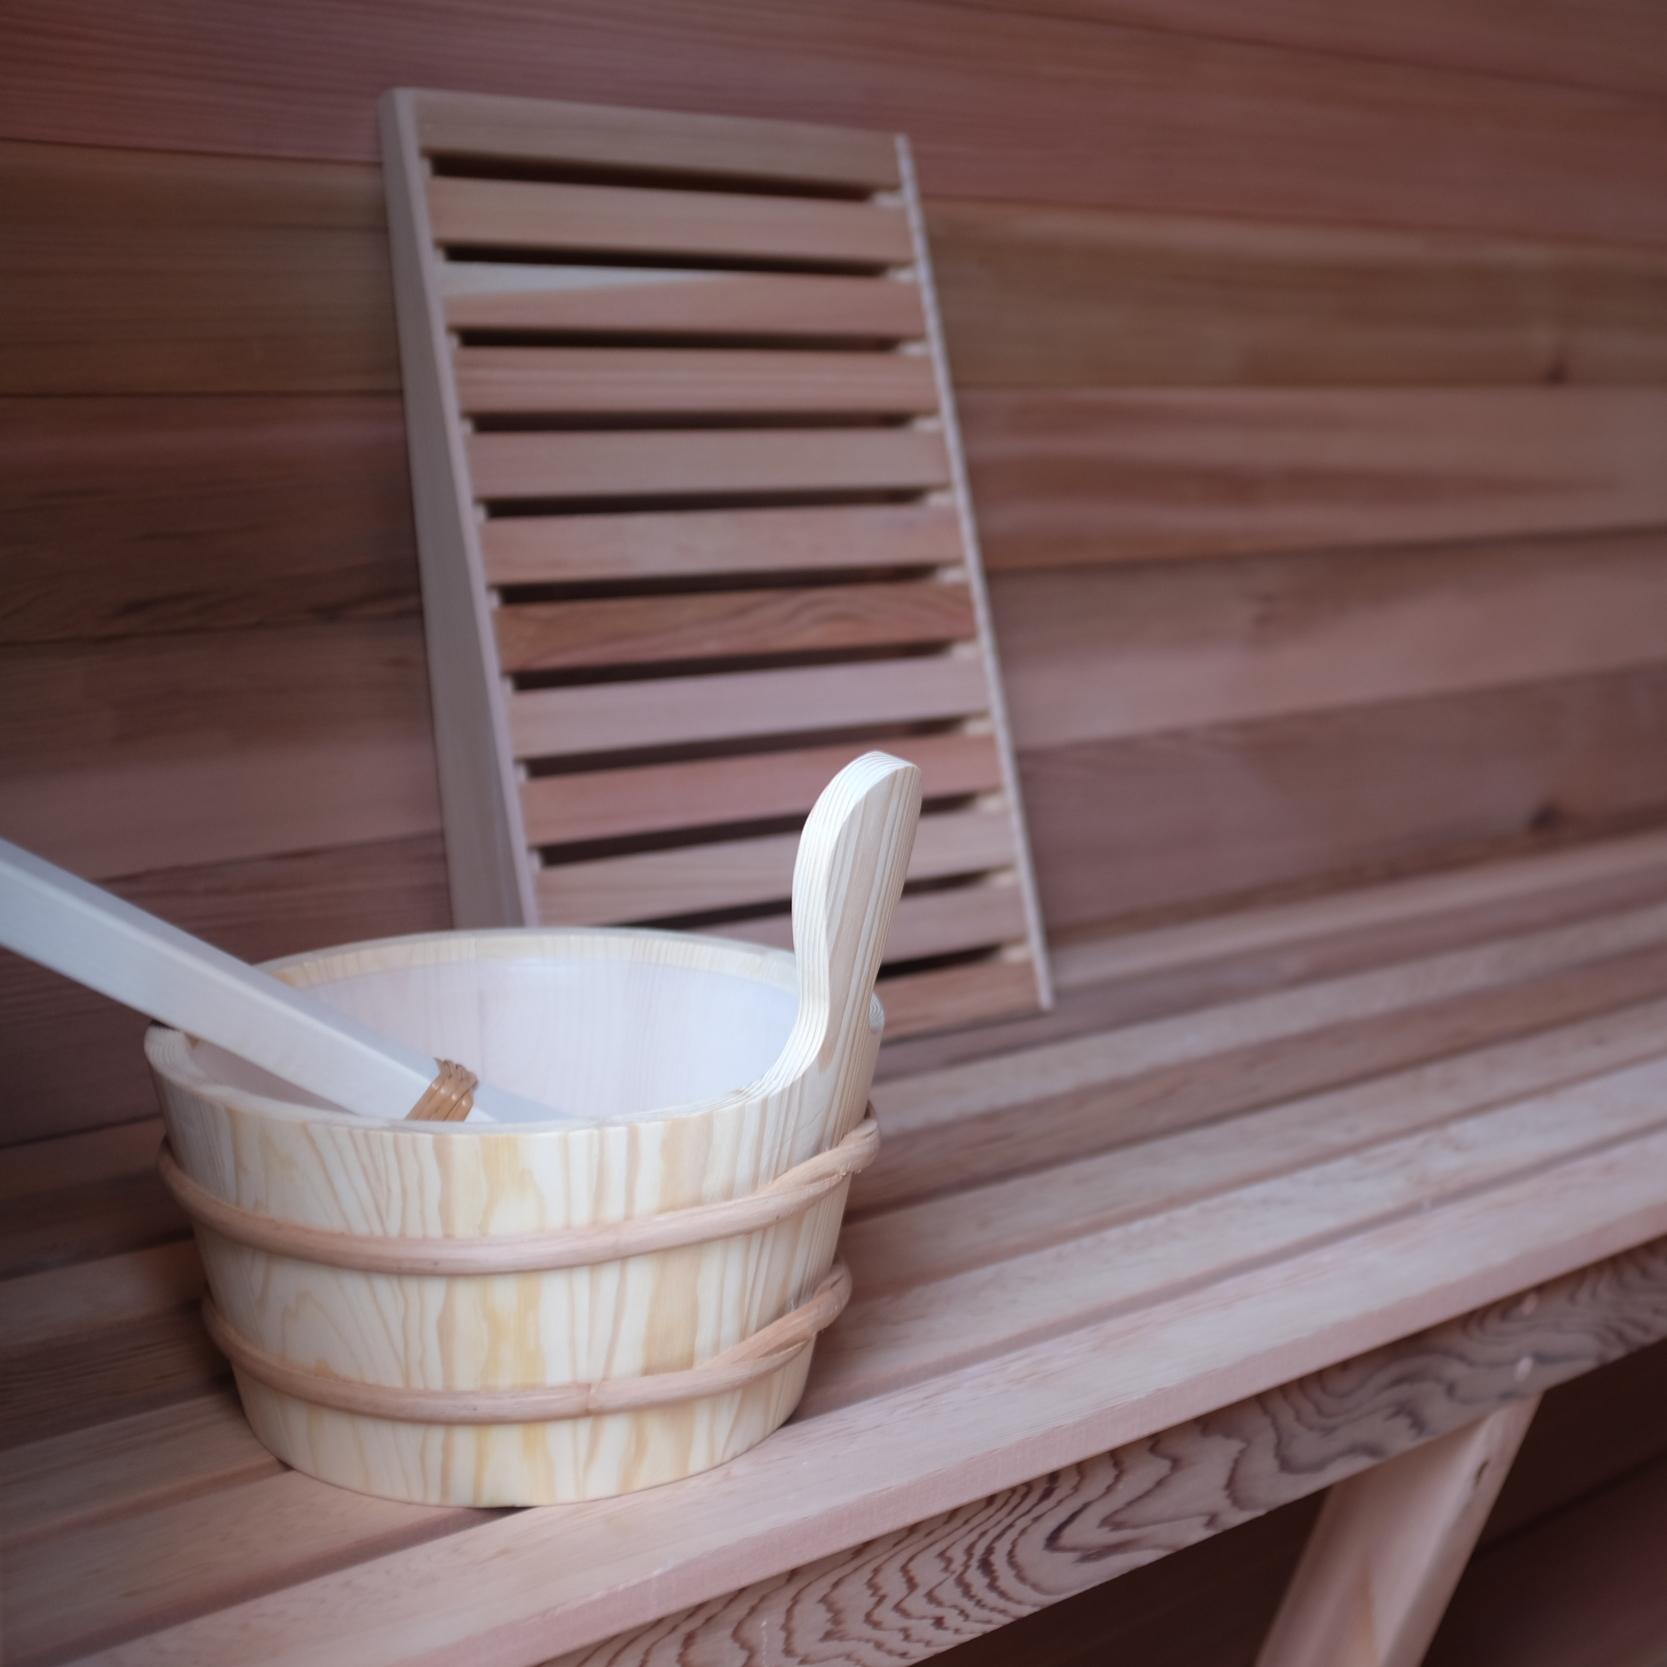 The Mobile Sauna